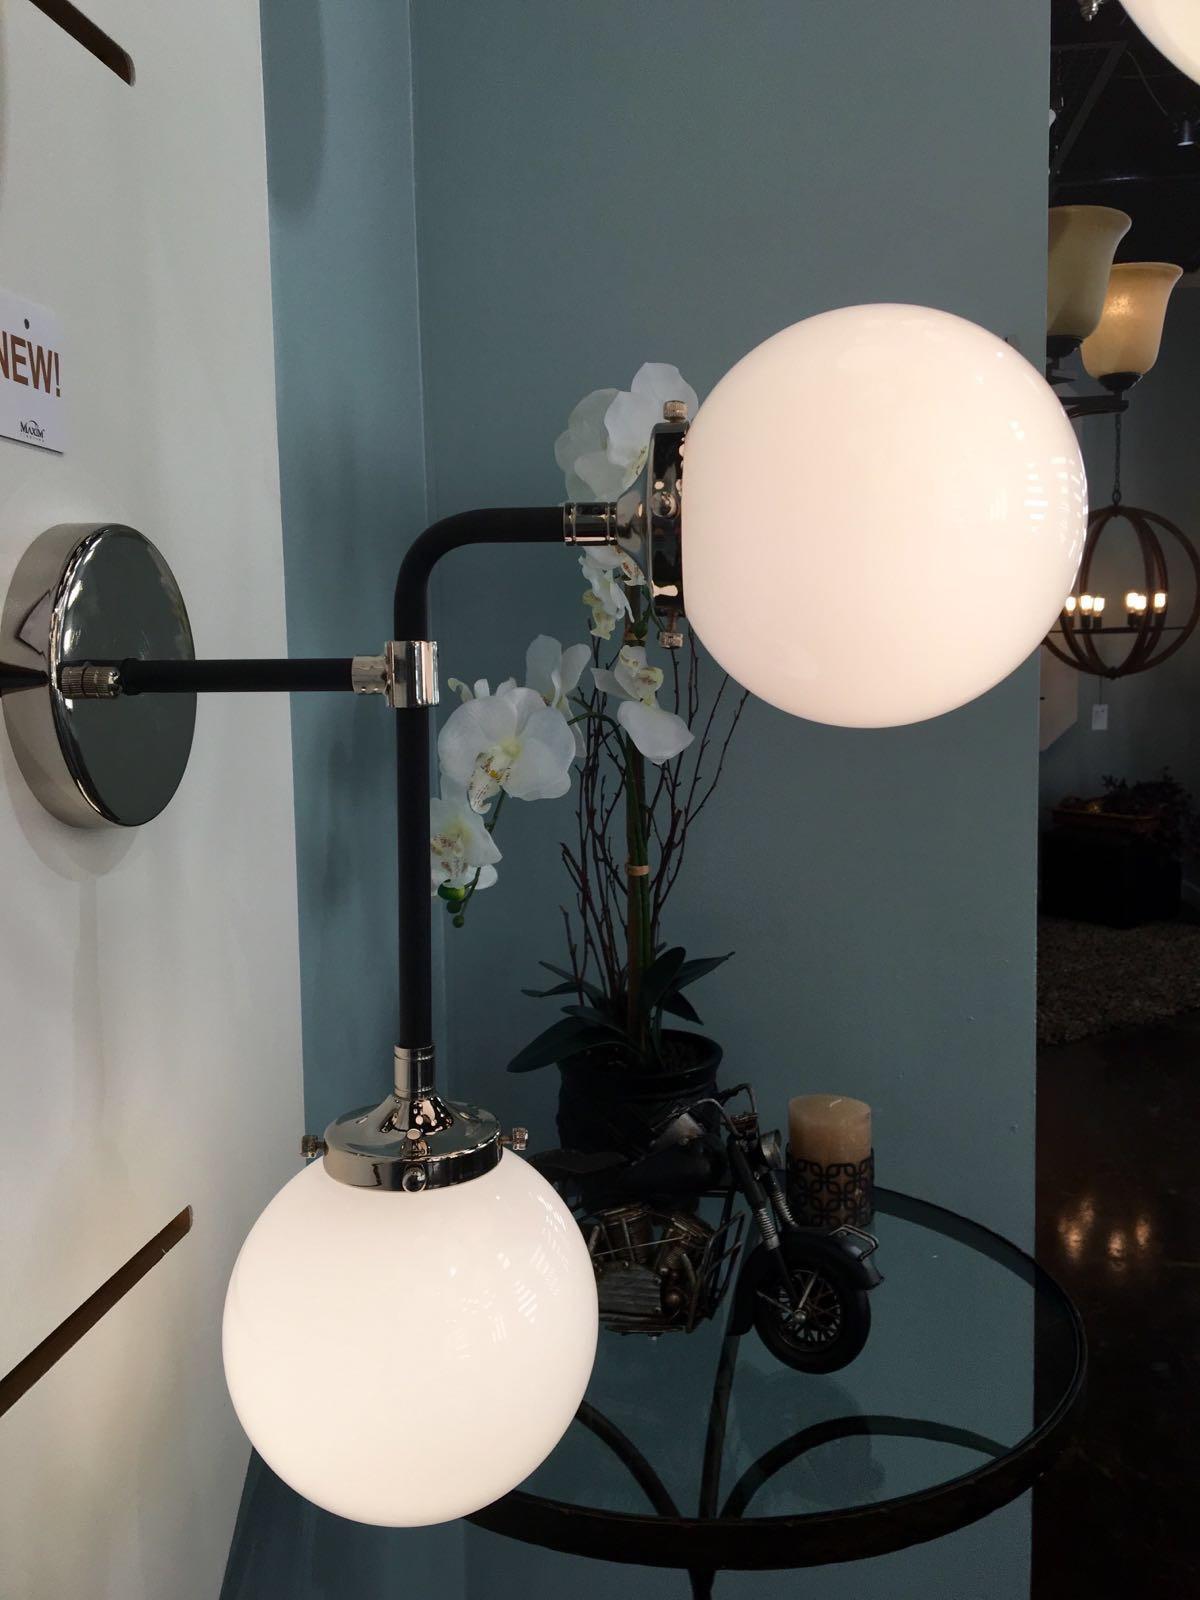 Atom Light Wall Sconce Wall Sconce Maxim Lighting - 2 light bathroom sconce